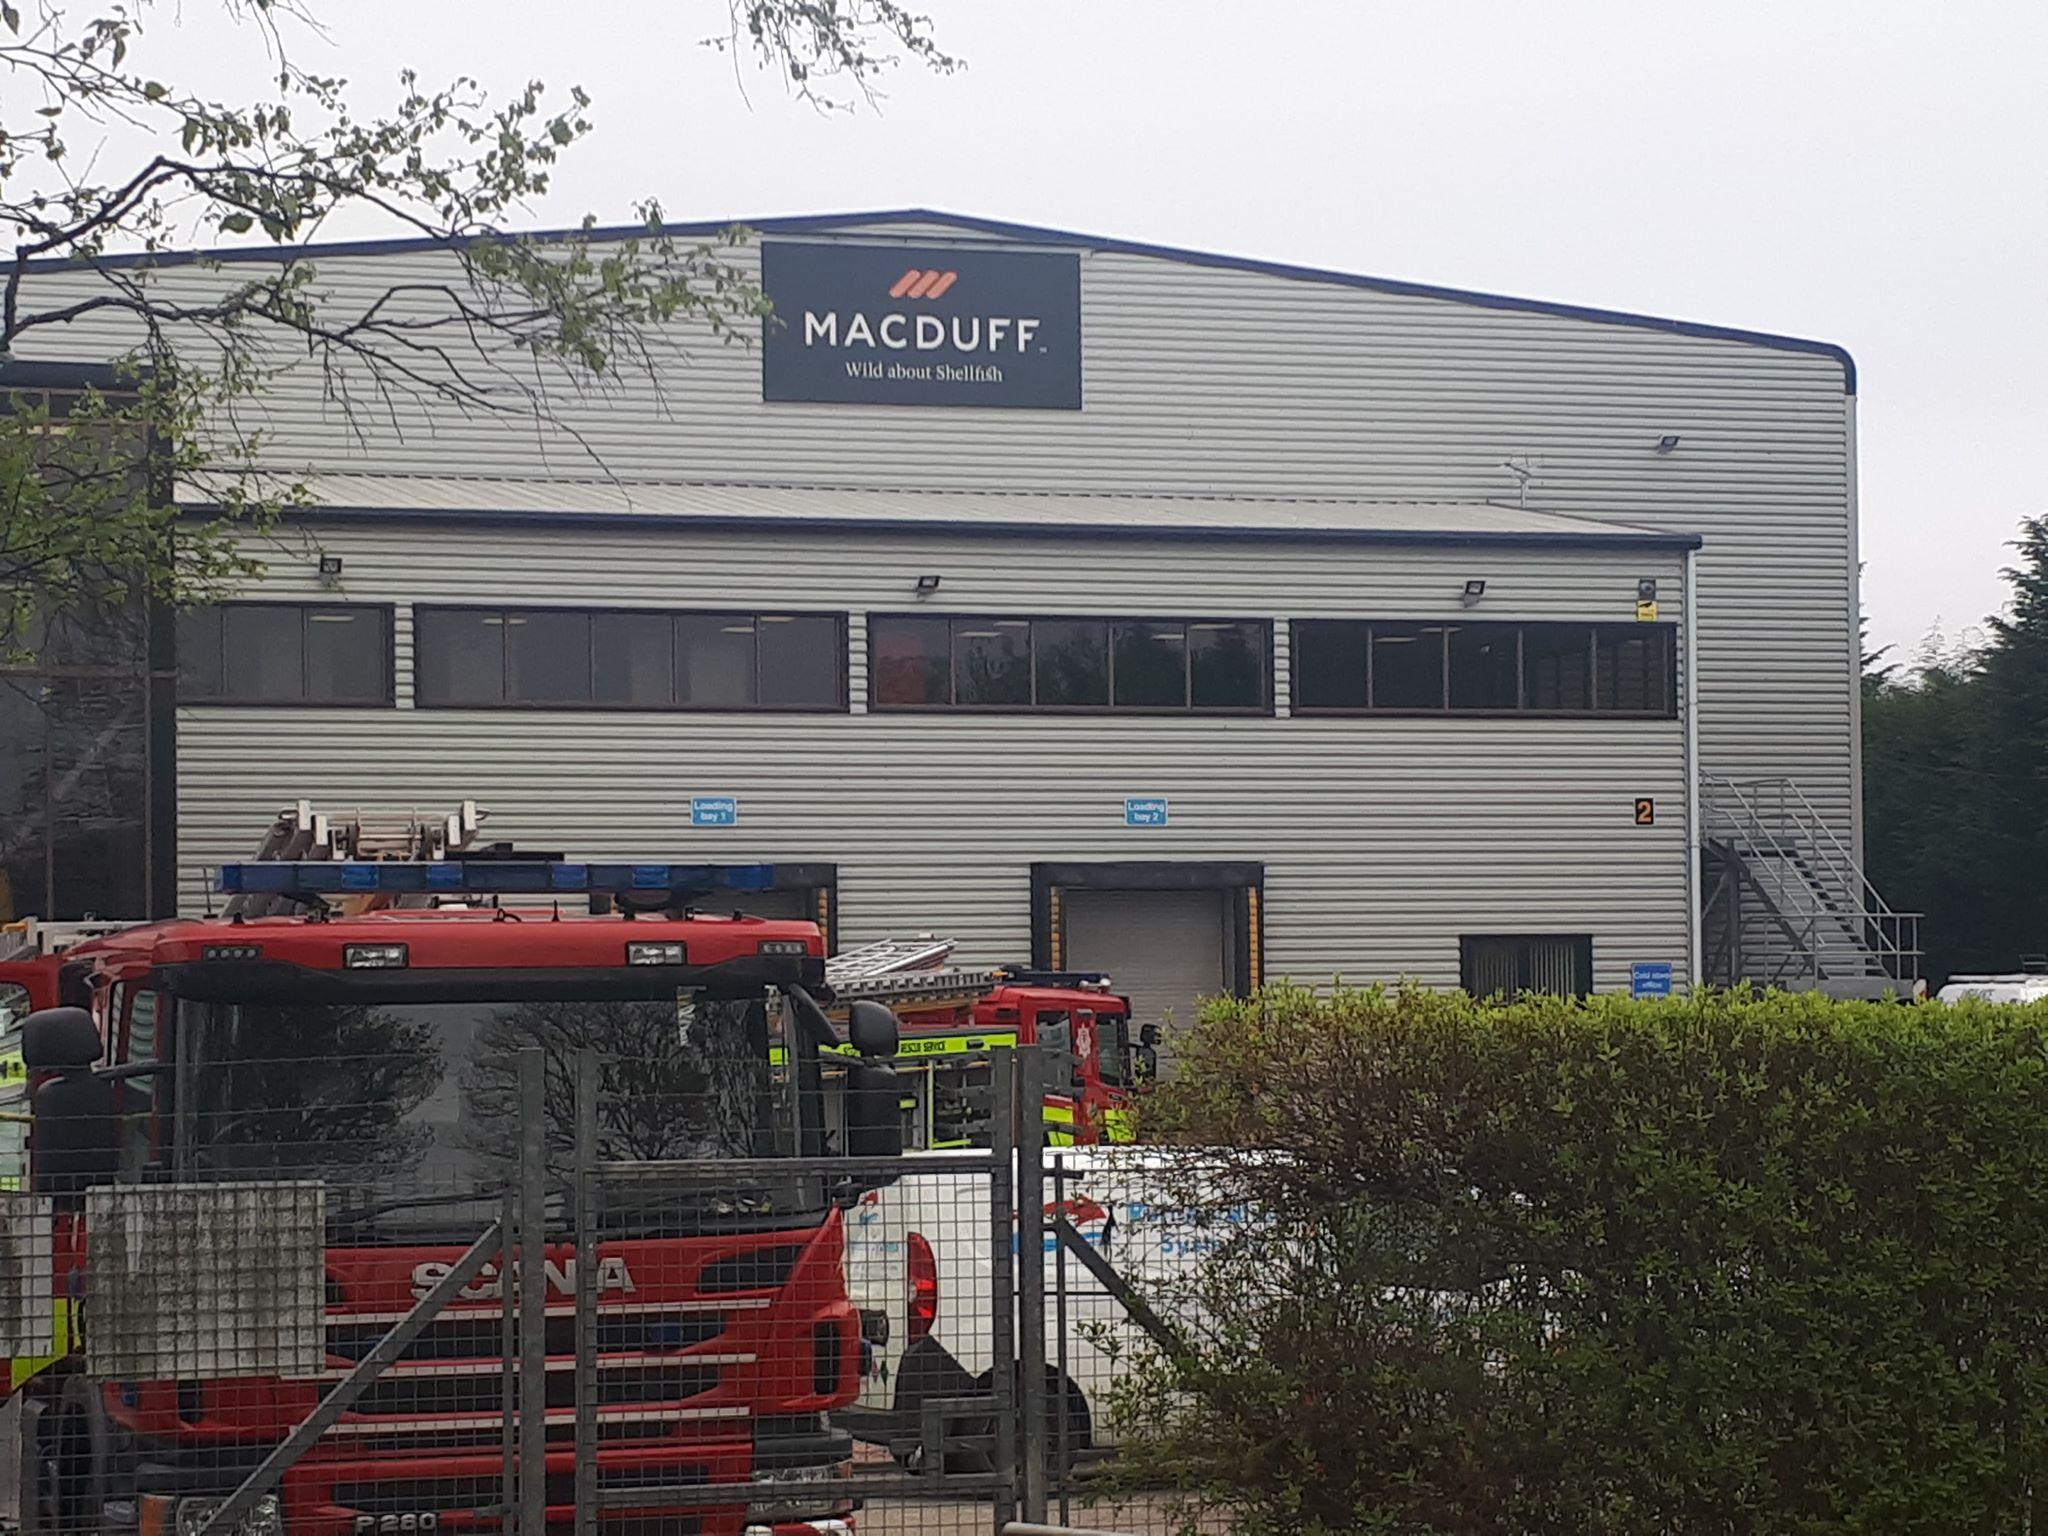 Macduff Shellfish on Station Road, Mintlaw, during the evacuation